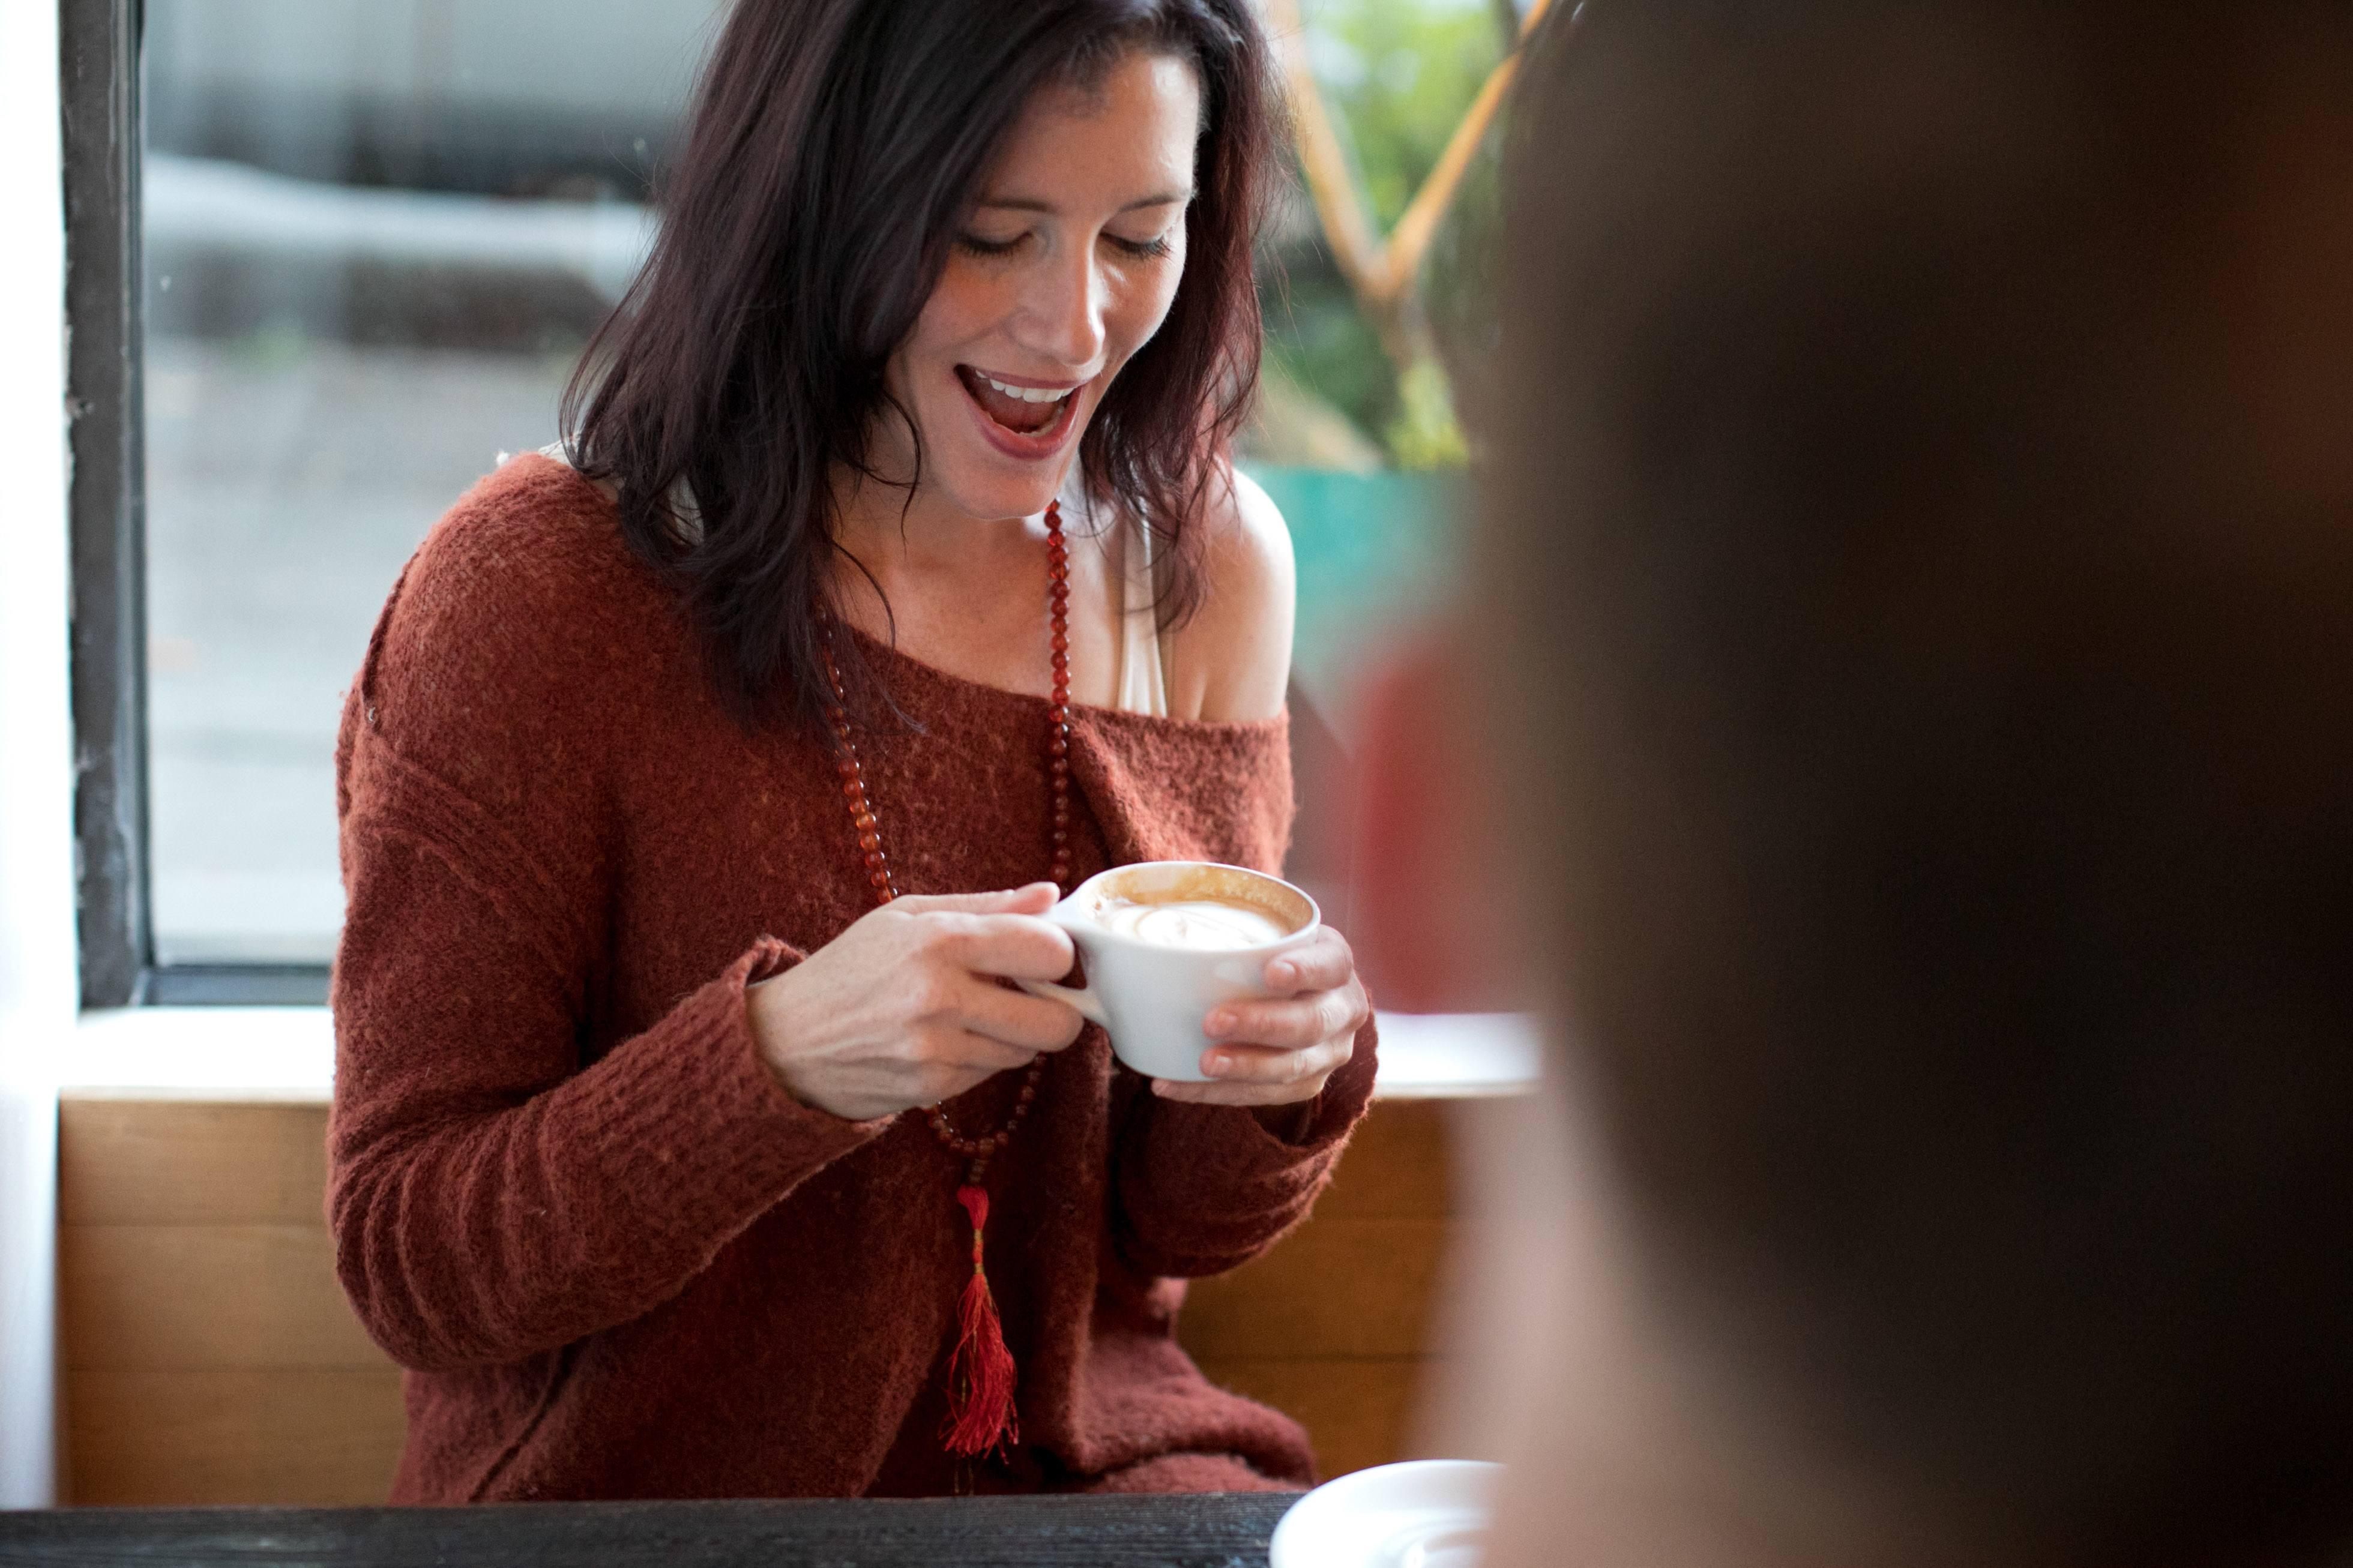 Coffee time with friends / Rachel Scott